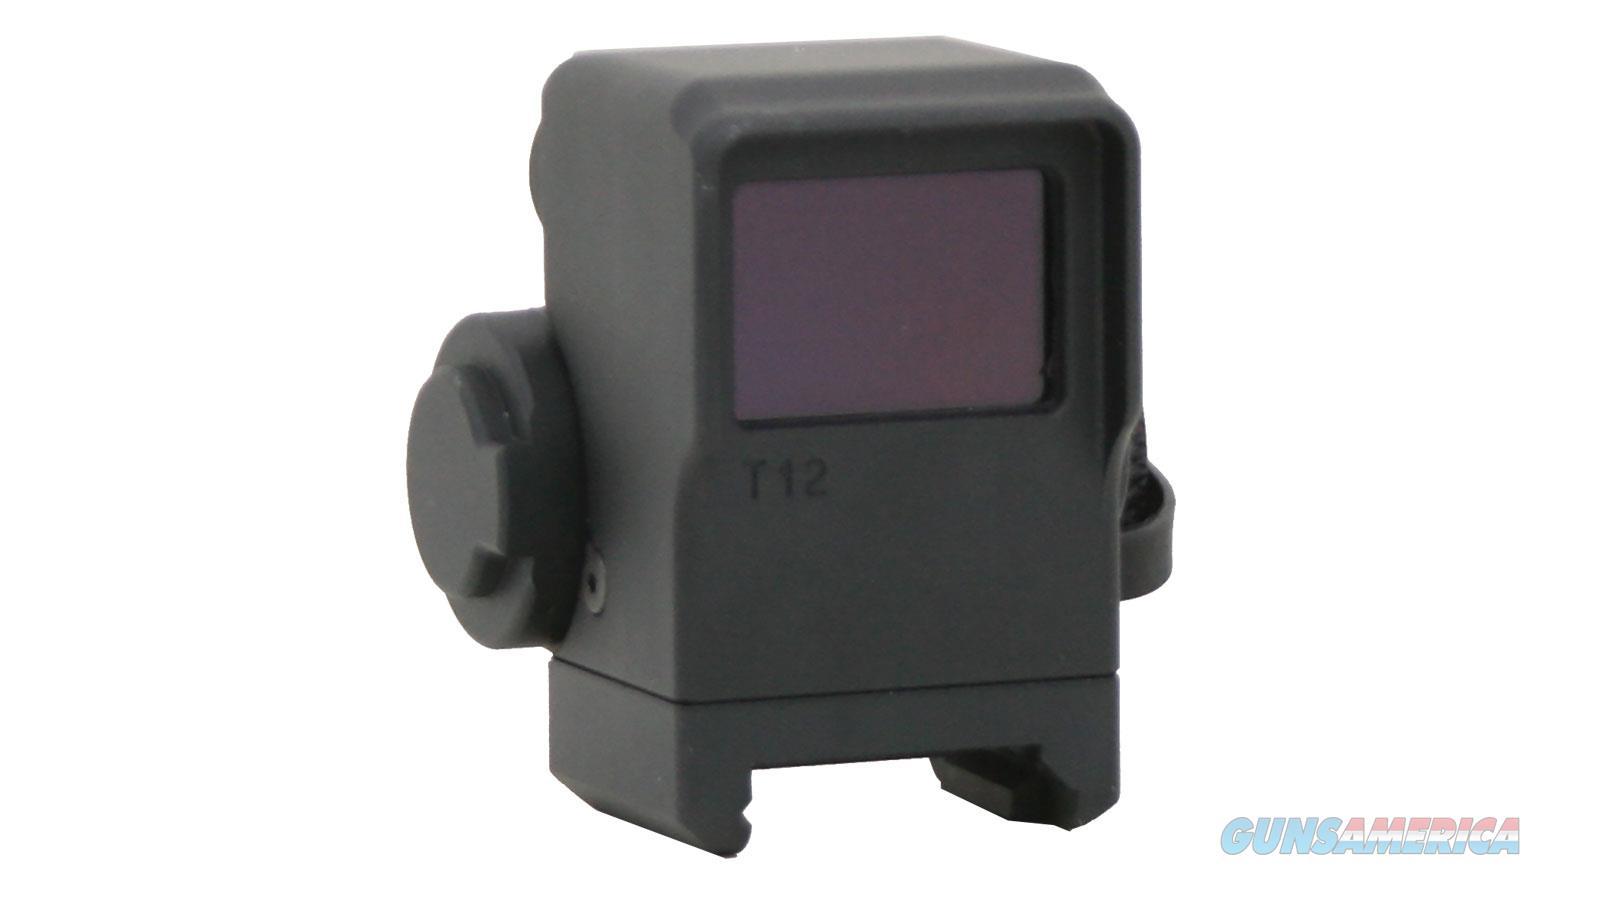 Torrey Pines Logic, Inc. Thermal Optic Tact 80X60 T12-V  Non-Guns > Night Vision